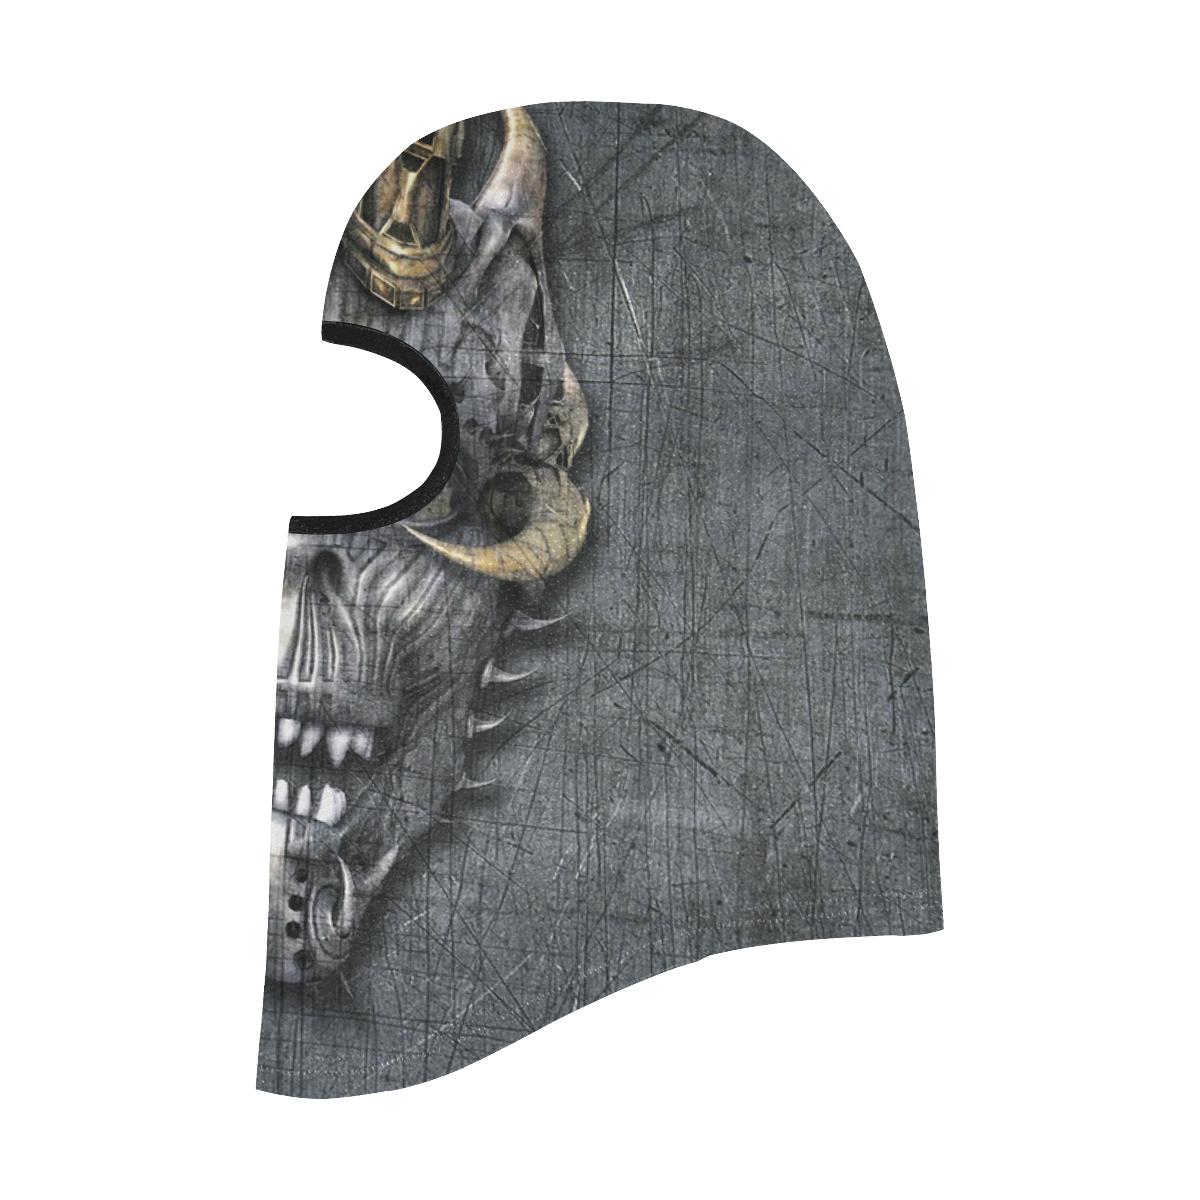 Creepy Demon Skull All Over Print Balaclava